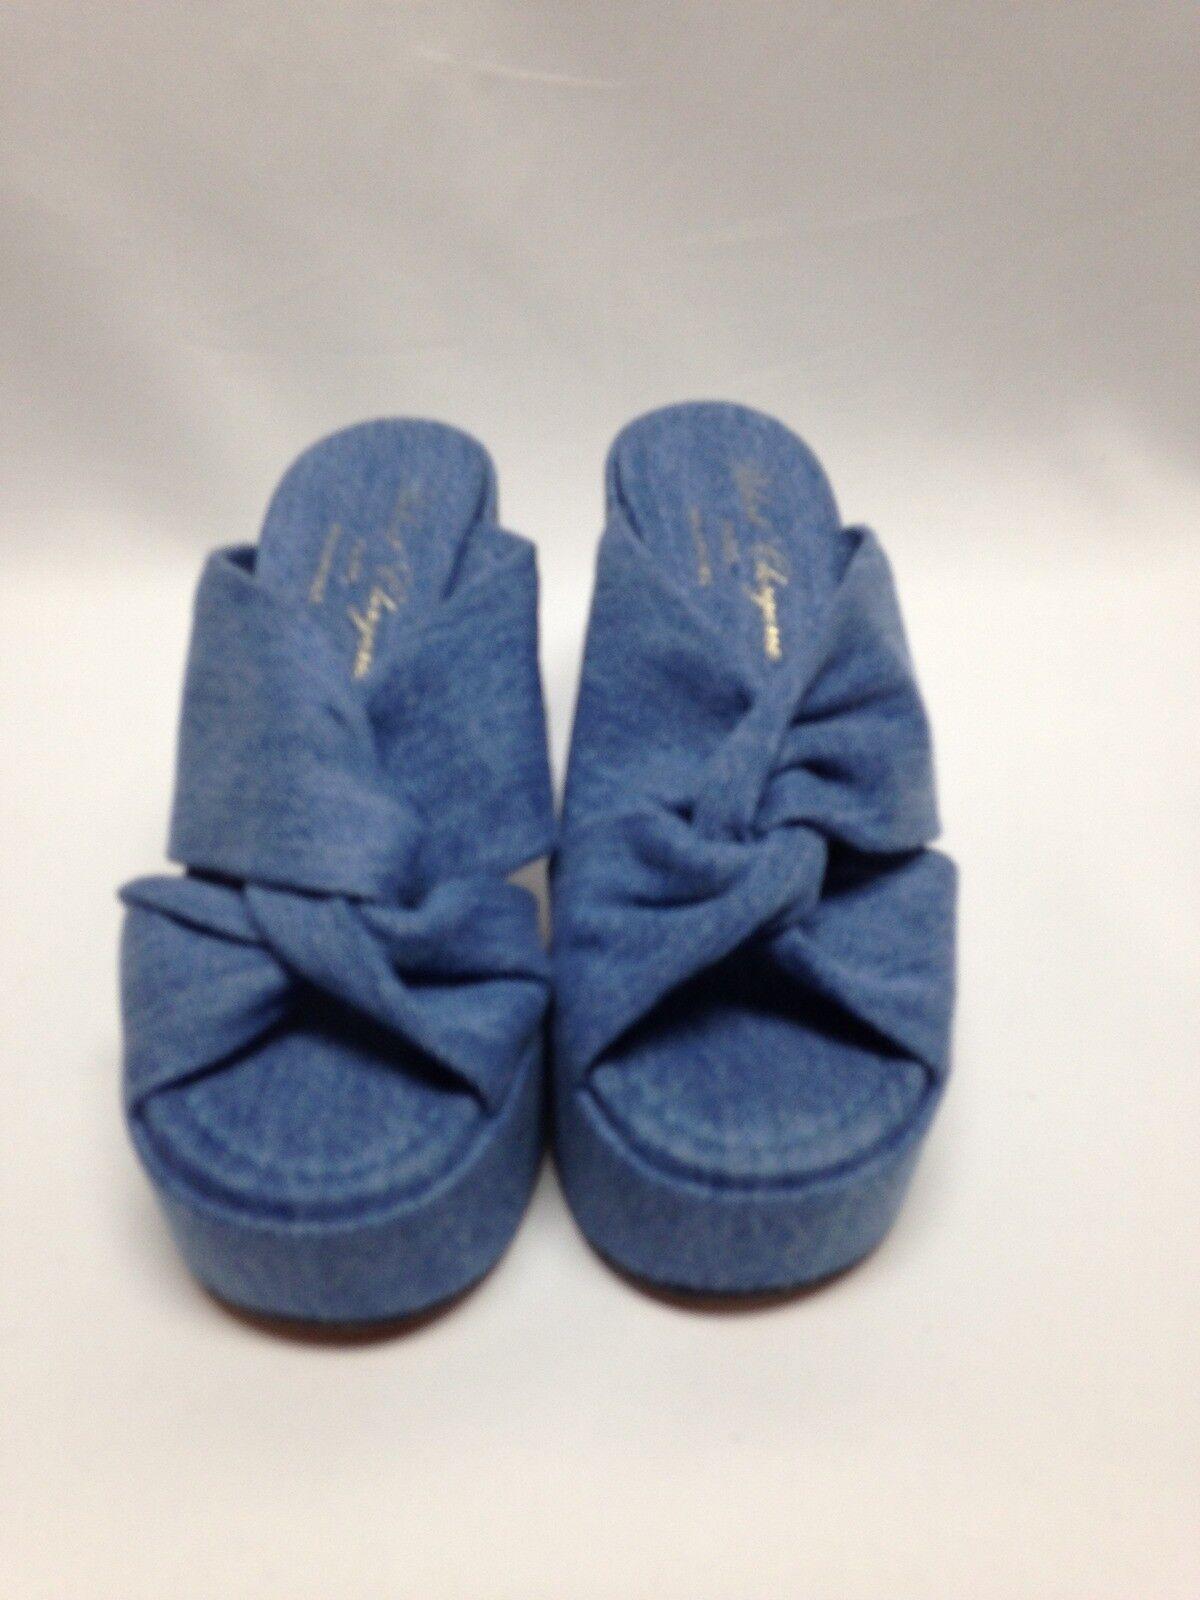 Robert Clergerie Clergerie Clergerie Esthert Denim Sandals Women shoes 5.5 bluee NWD 6bdb80